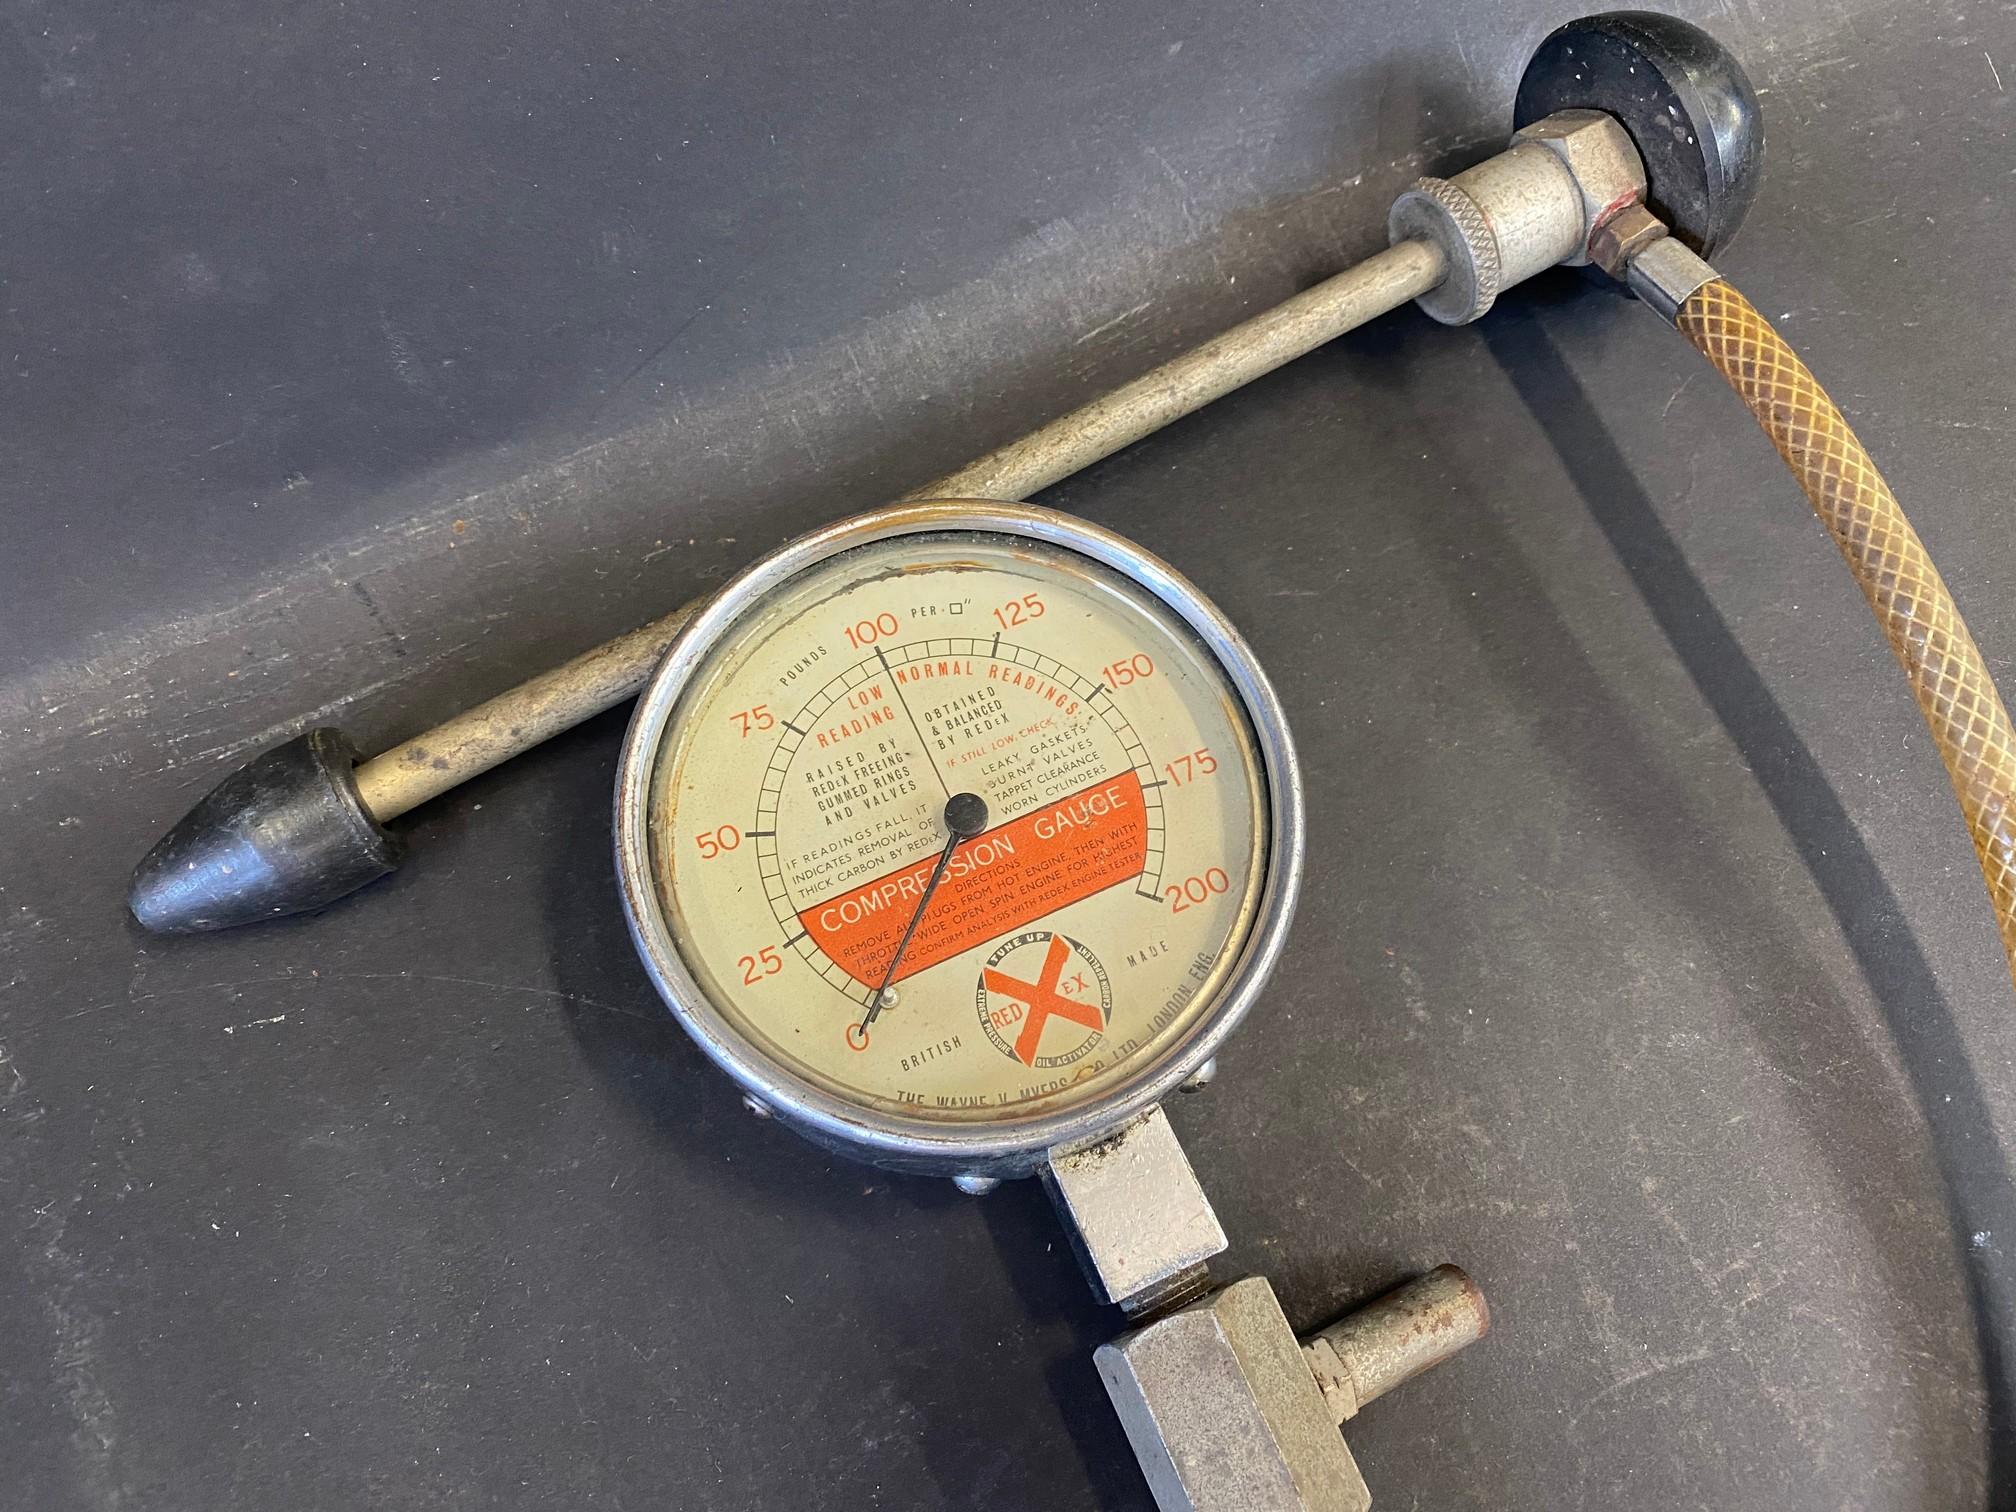 A Redex compression gauge. - Image 2 of 2